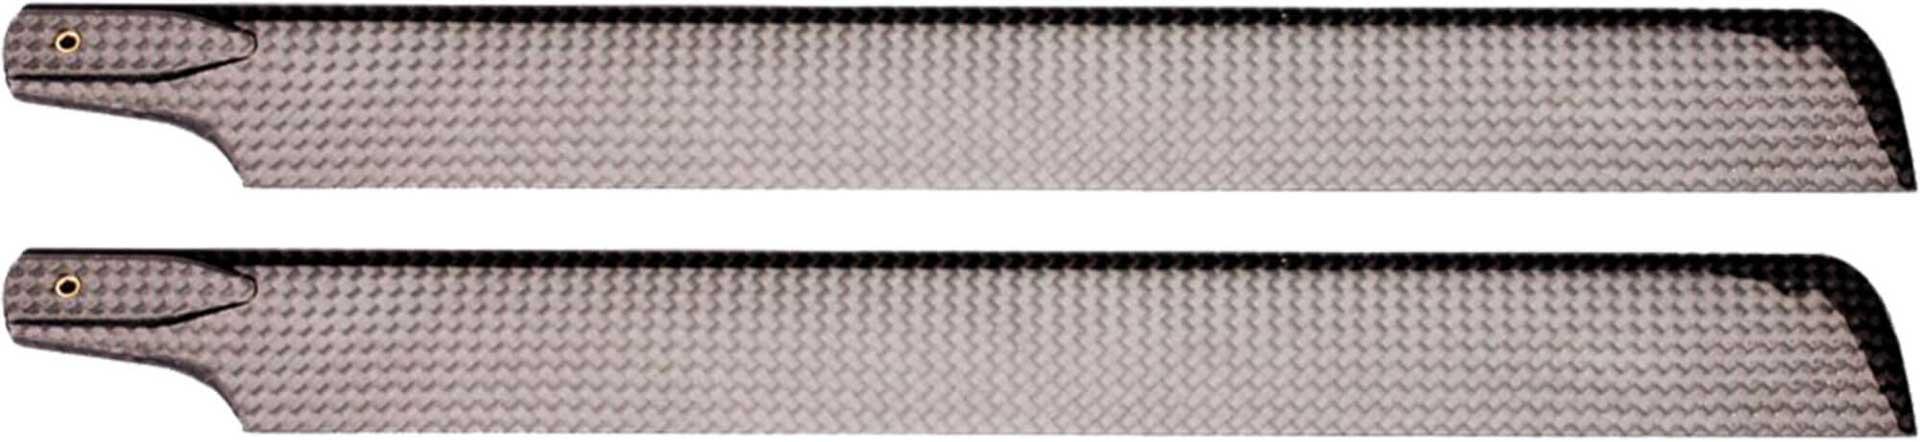 BLADE (E-FLITE) HAUPTROTORBLÄTTER CARBON 245MM BLADE 250 CFX / 300 X